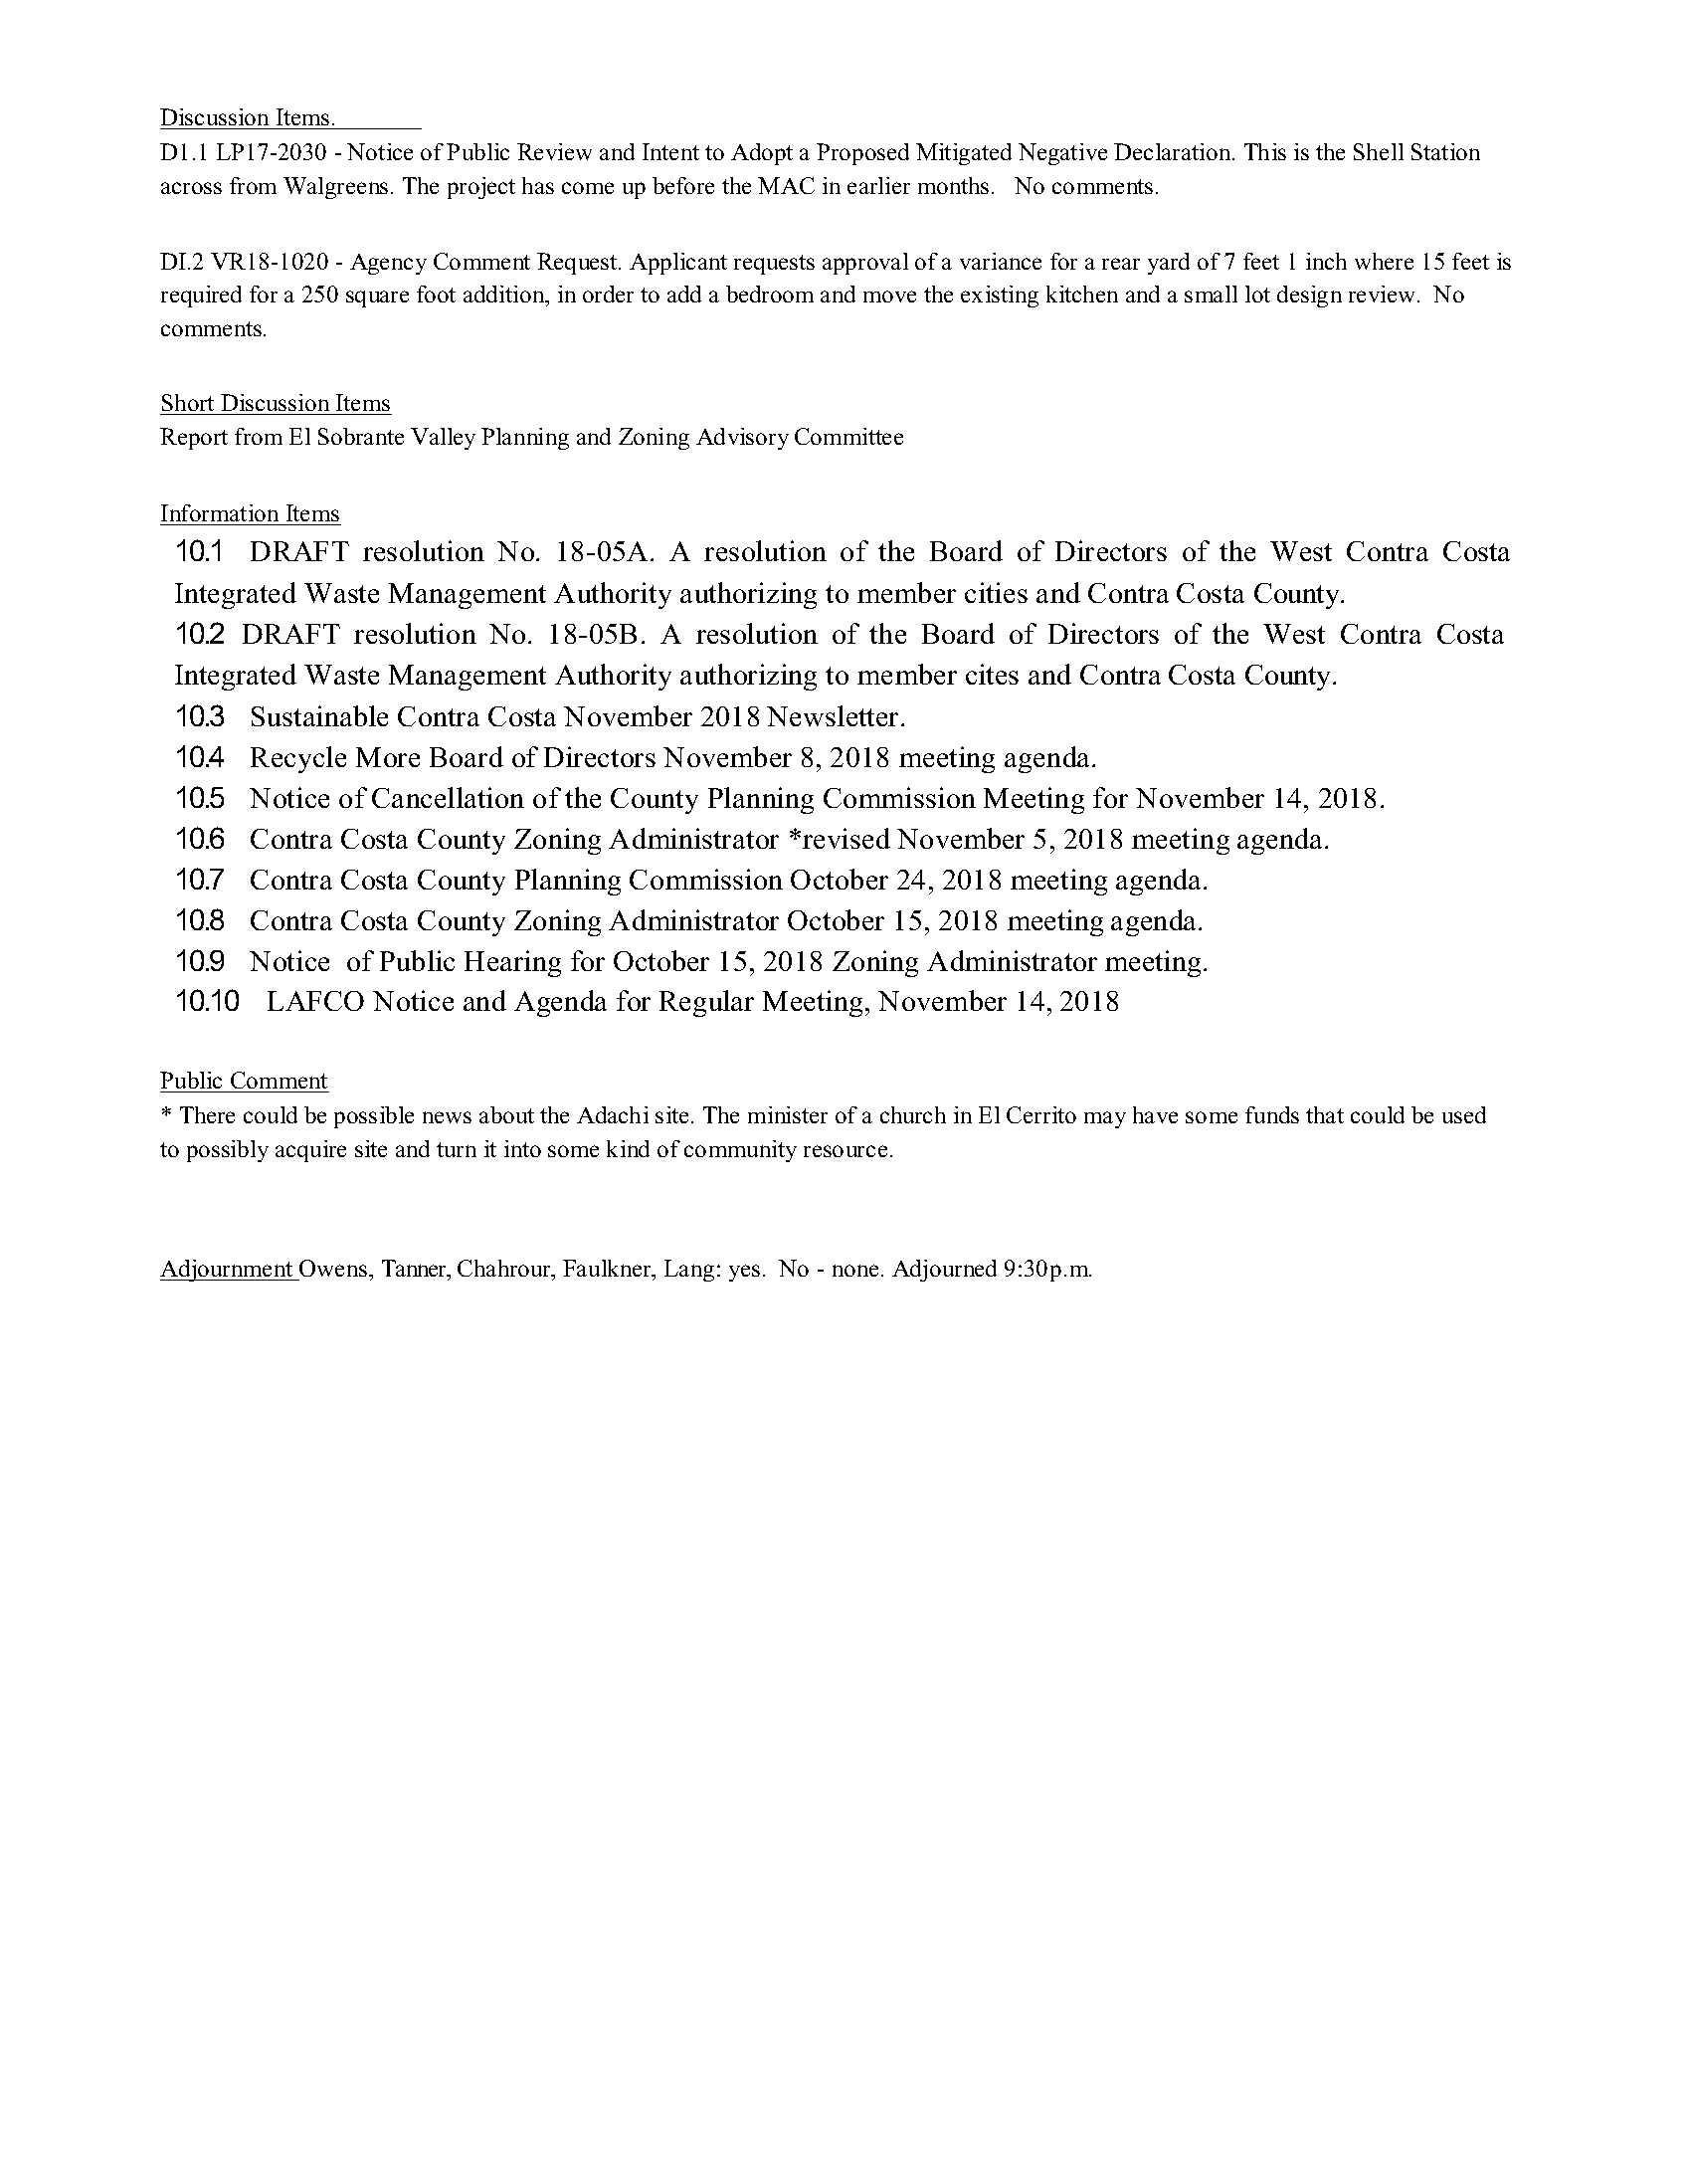 ESMAC Agenda 12.13.2018 (51 Pages)_4.jpg